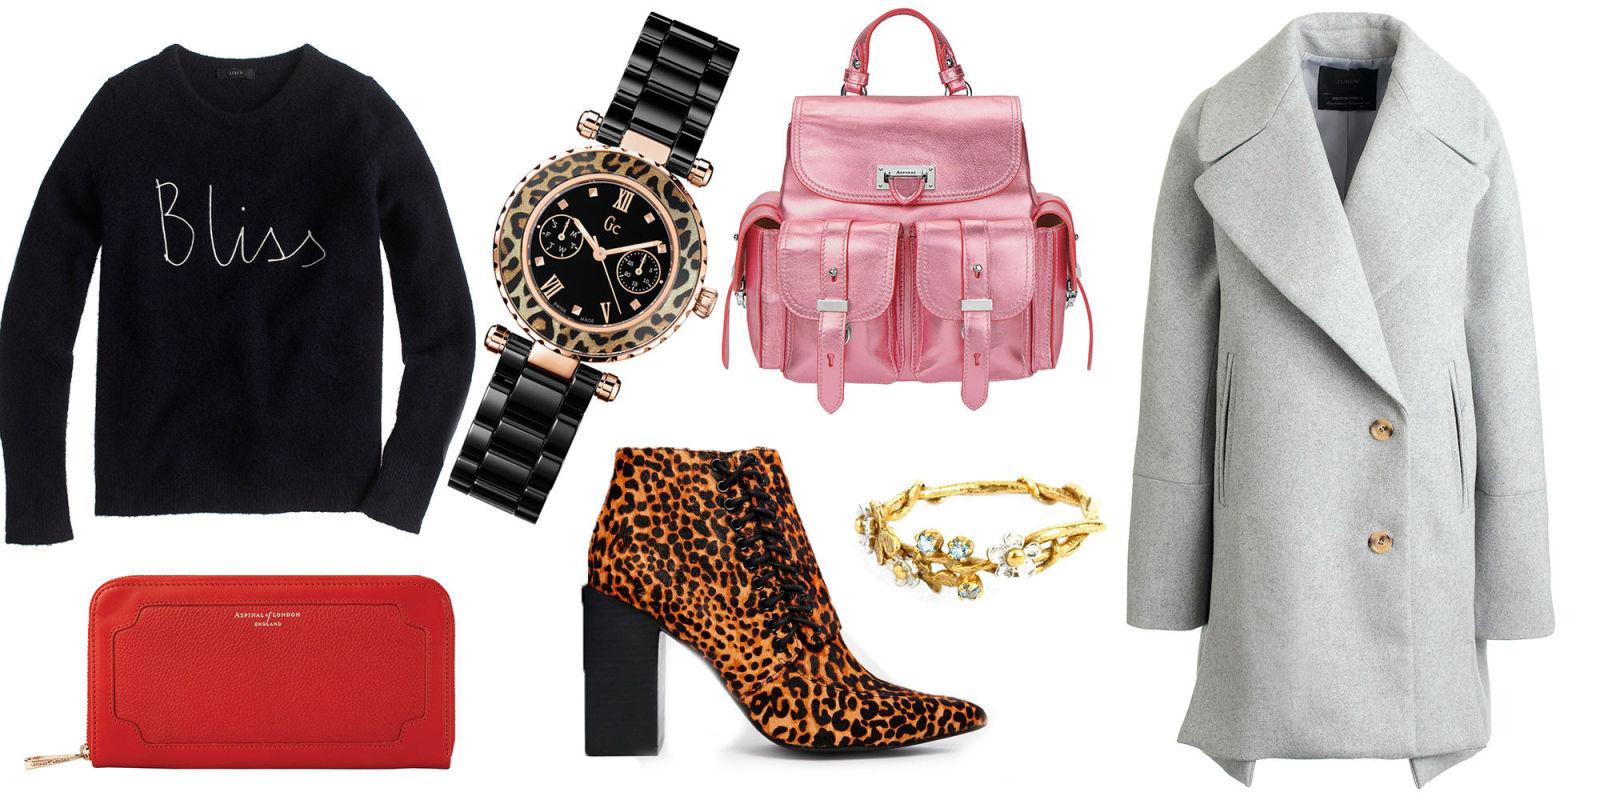 Fashion design gift ideas 100